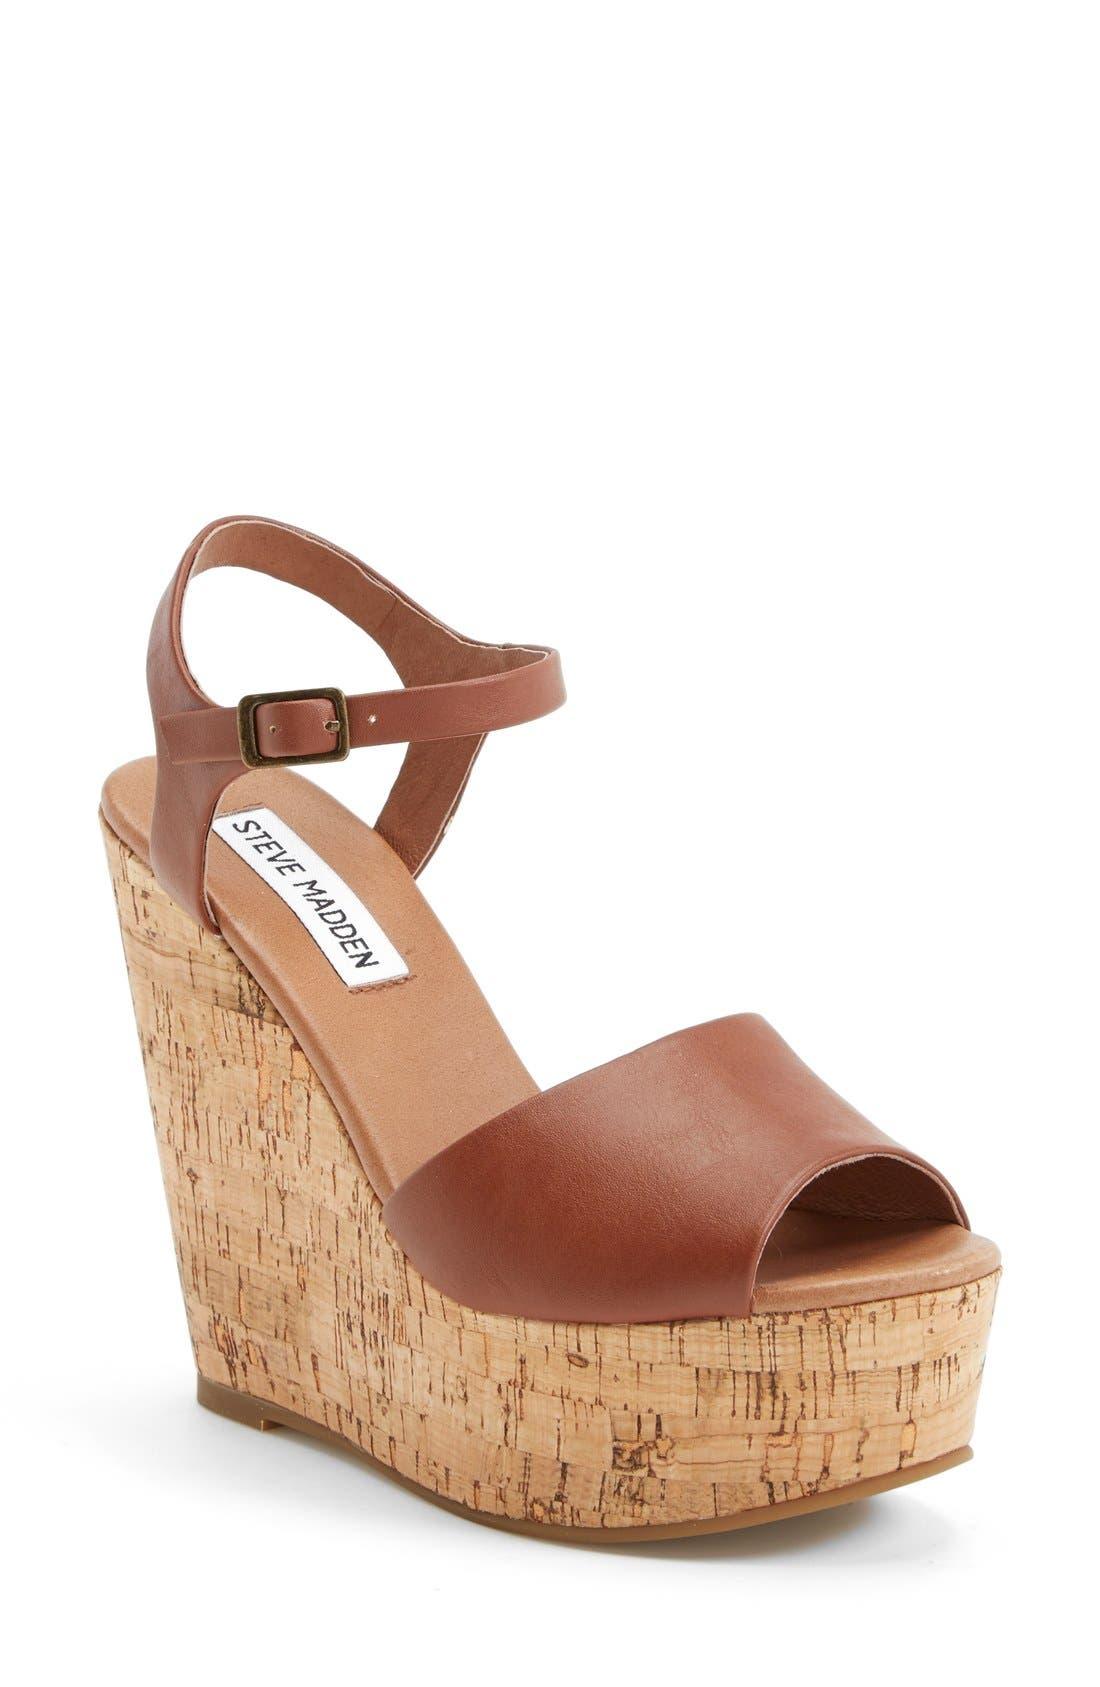 'Korkey' Ankle Strap Wedge Platform Sandal,                             Main thumbnail 1, color,                             Cognac